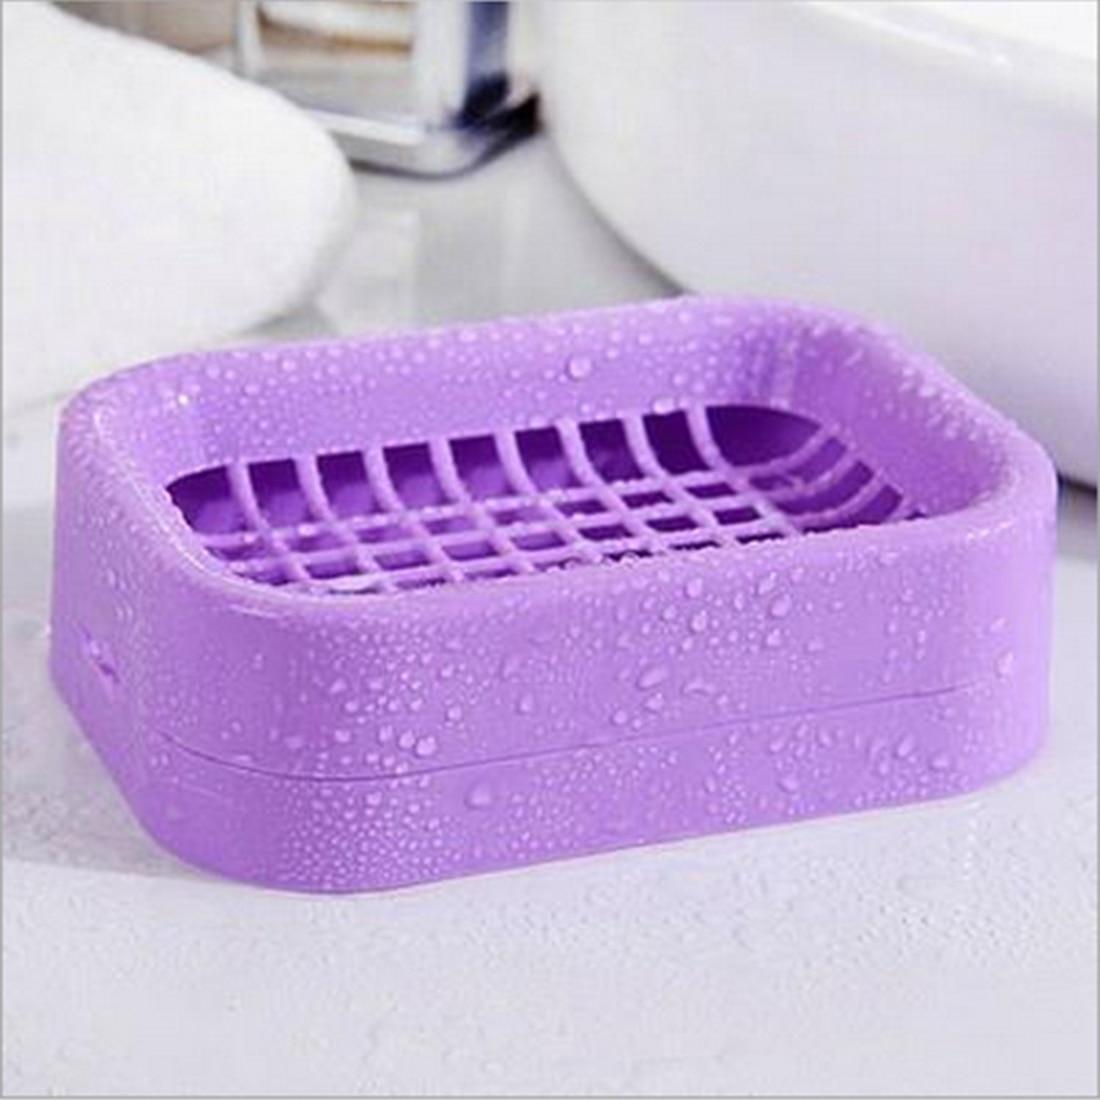 1pc Soap Draining Holder